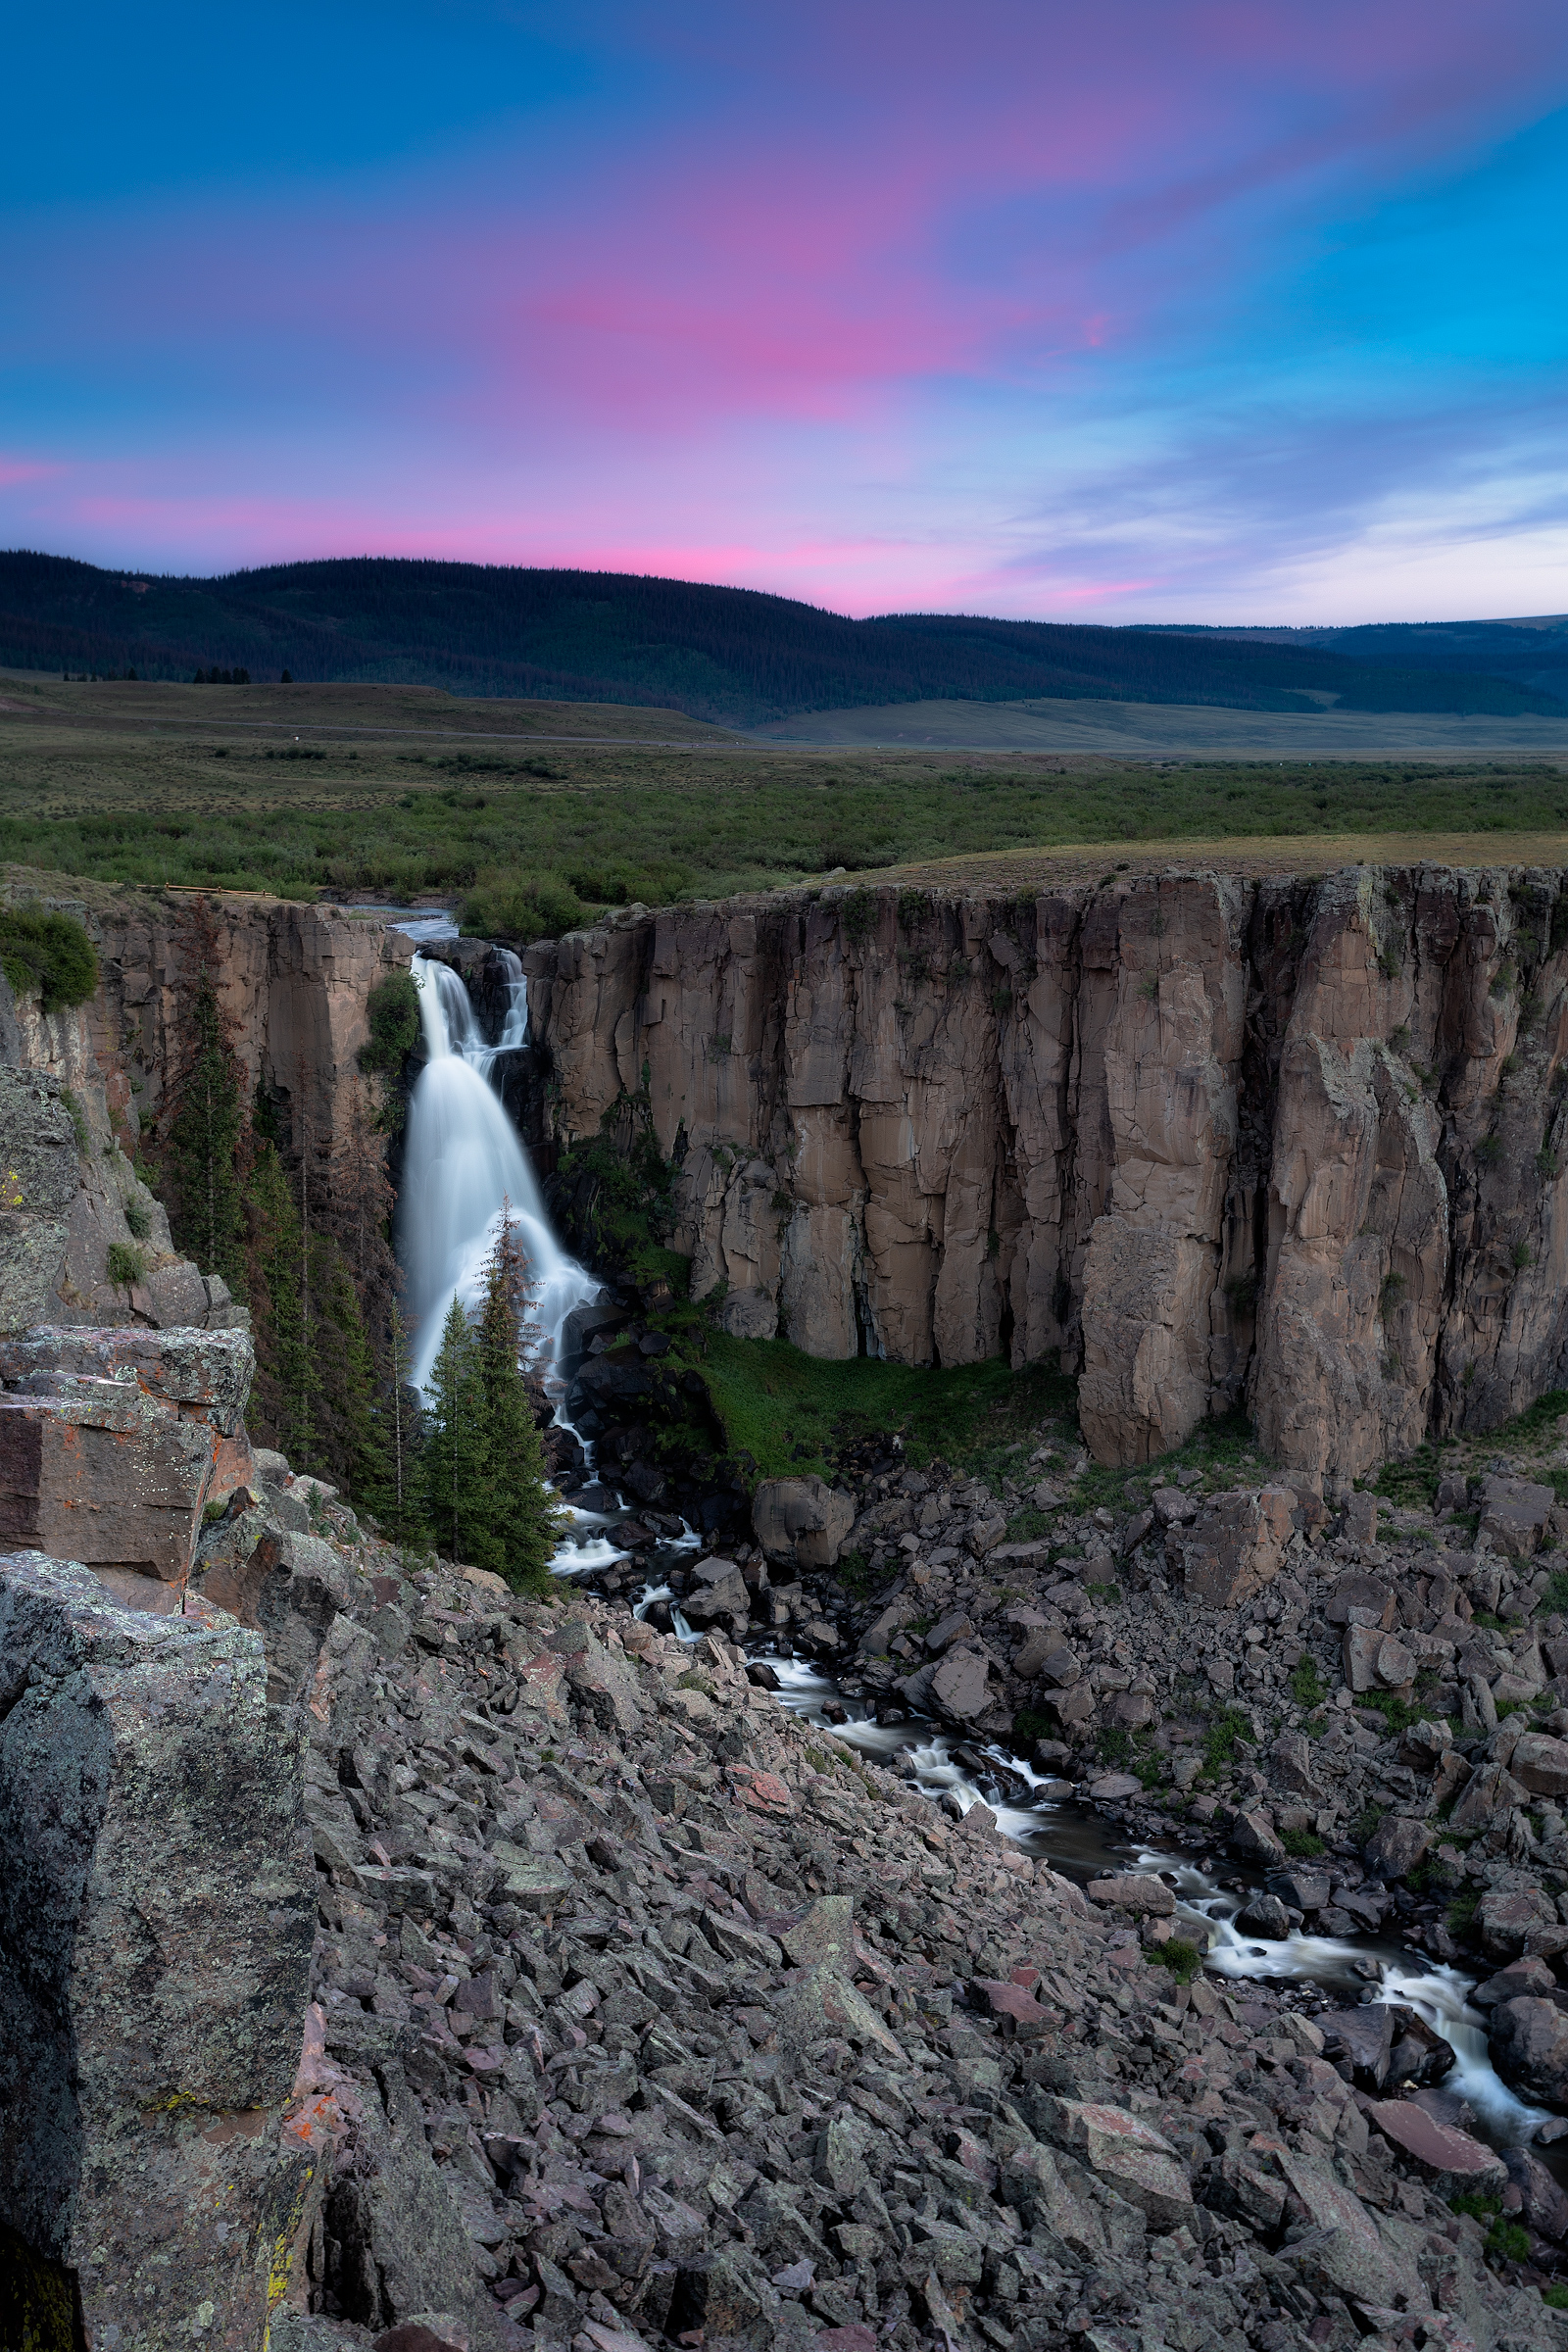 north-clear-creek-falls-colorado.jpg